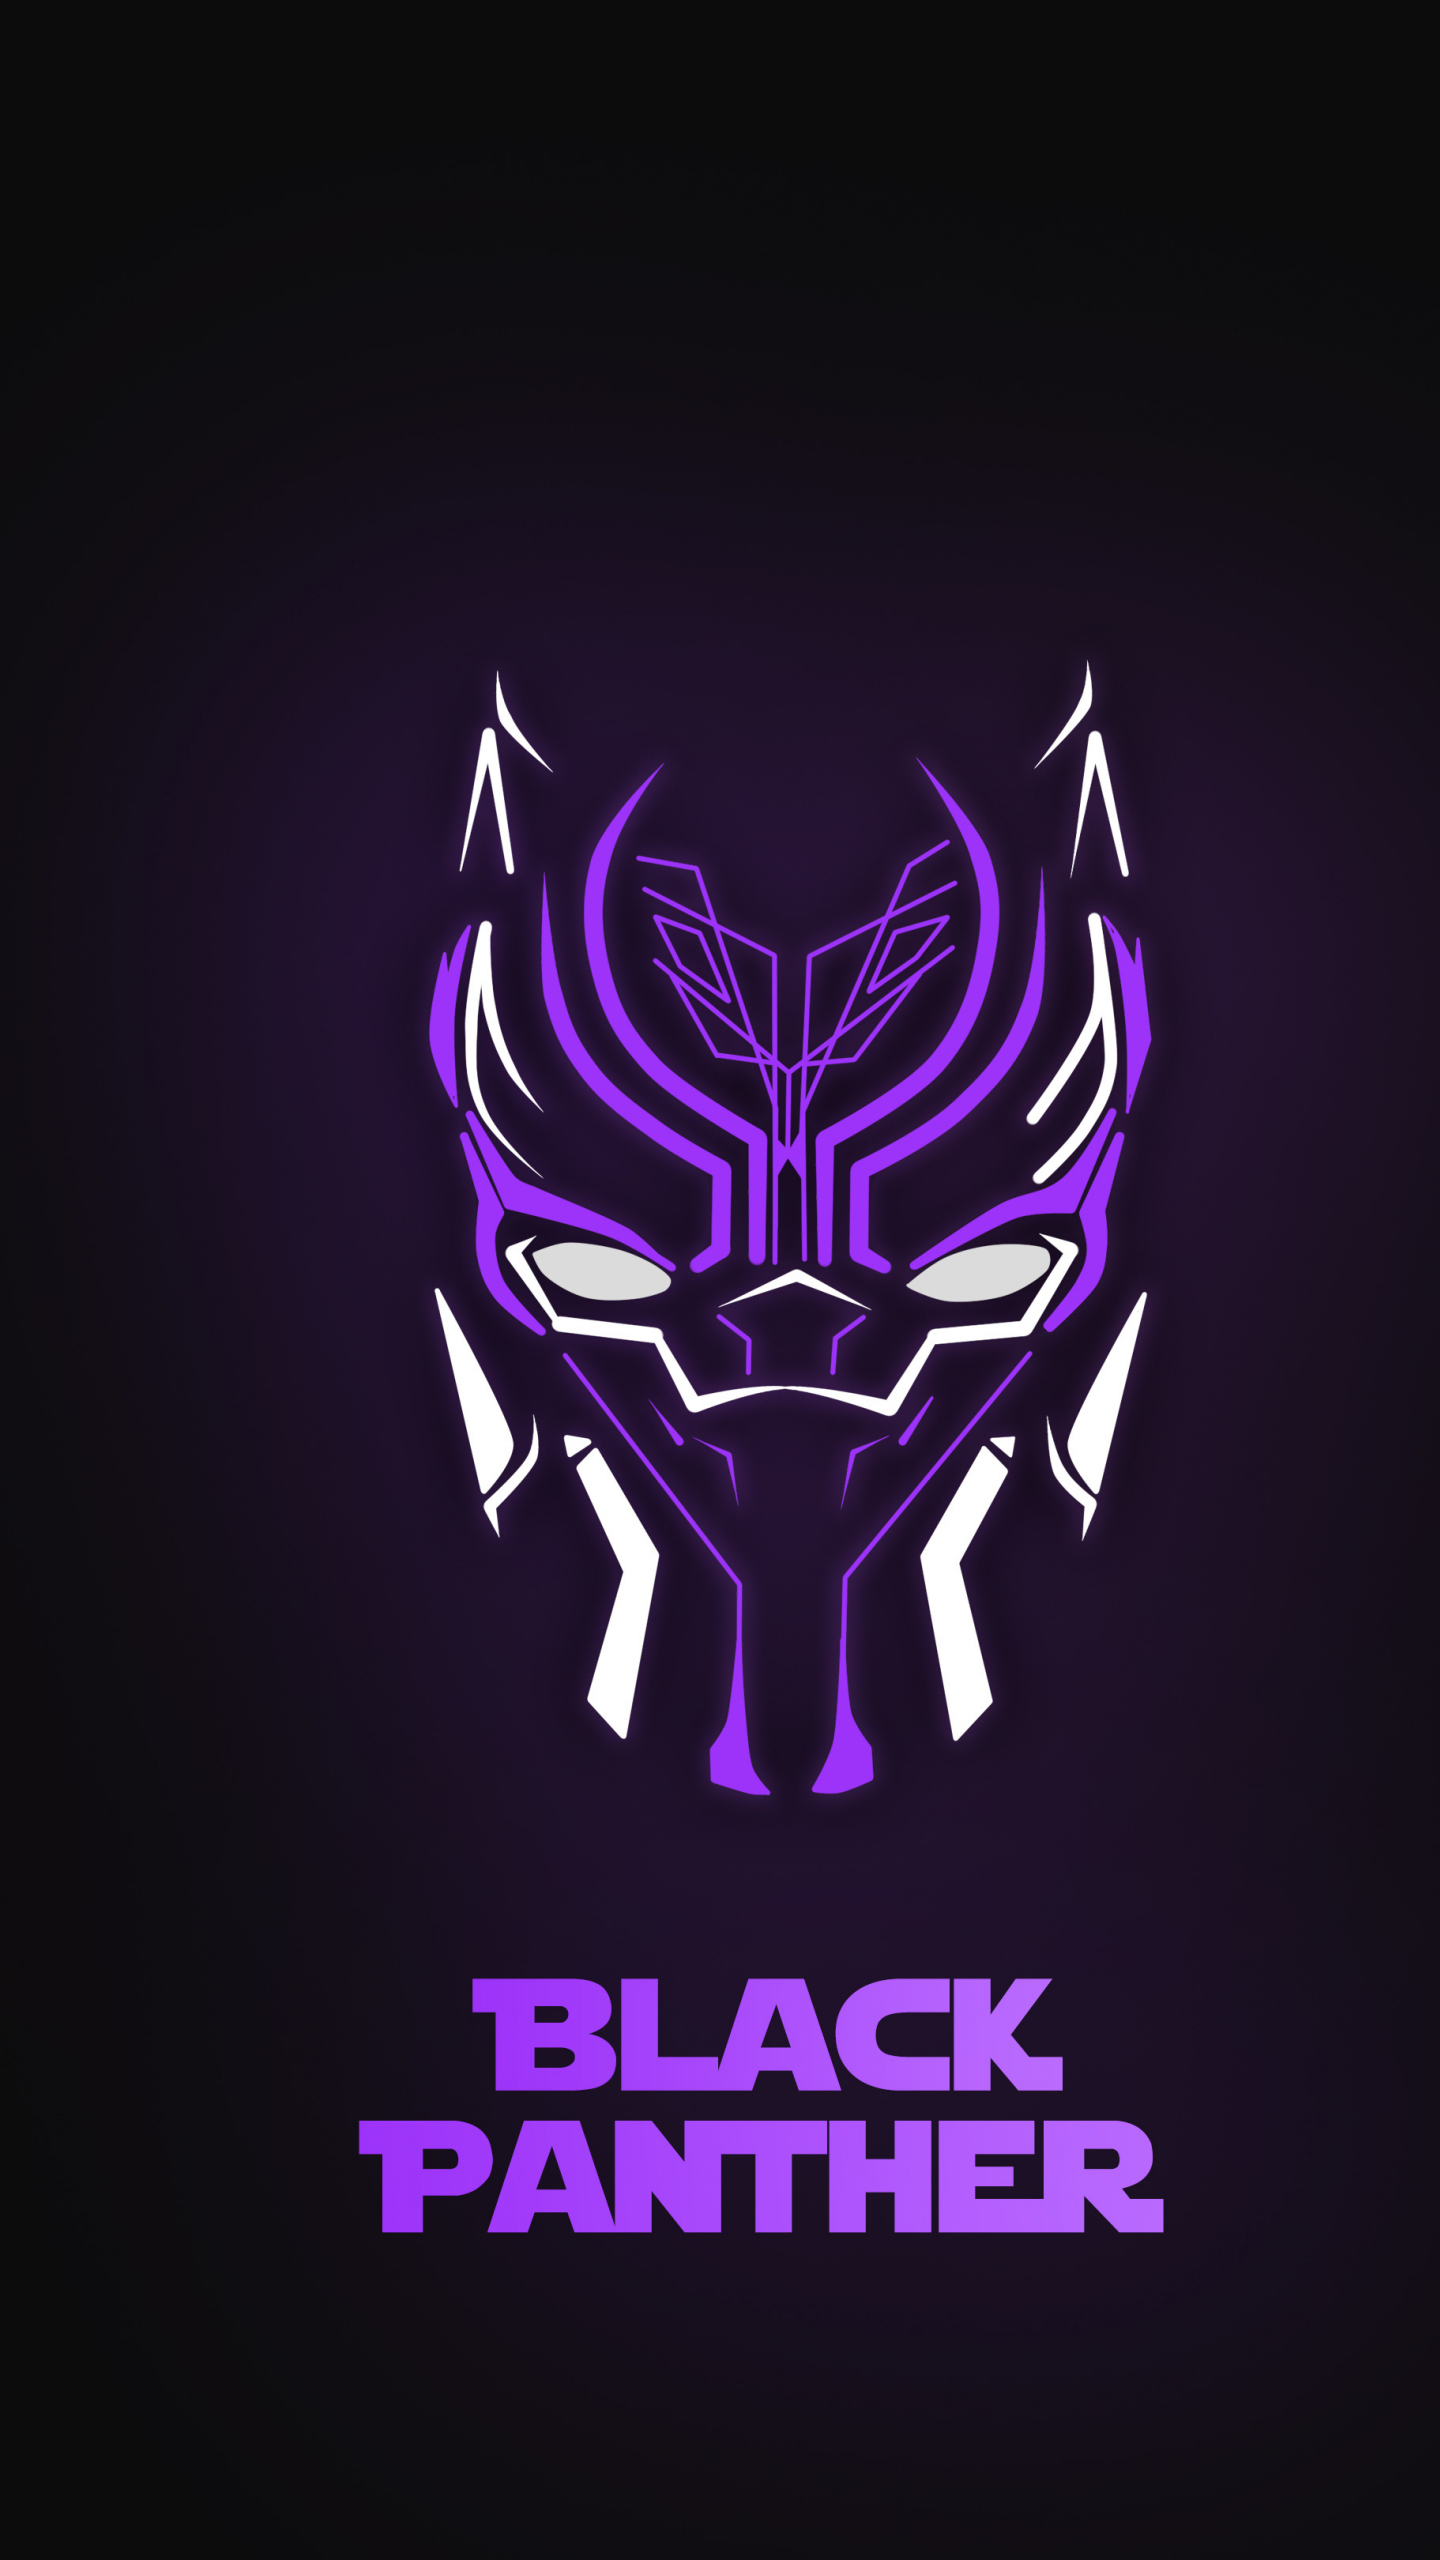 Download 1440x2560 Wallpaper Black Panther Neon Minimal 2018 Qhd Samsung Galaxy S6 S7 Edge Note Lg G4 1440x2560 Hd Image Background 8067